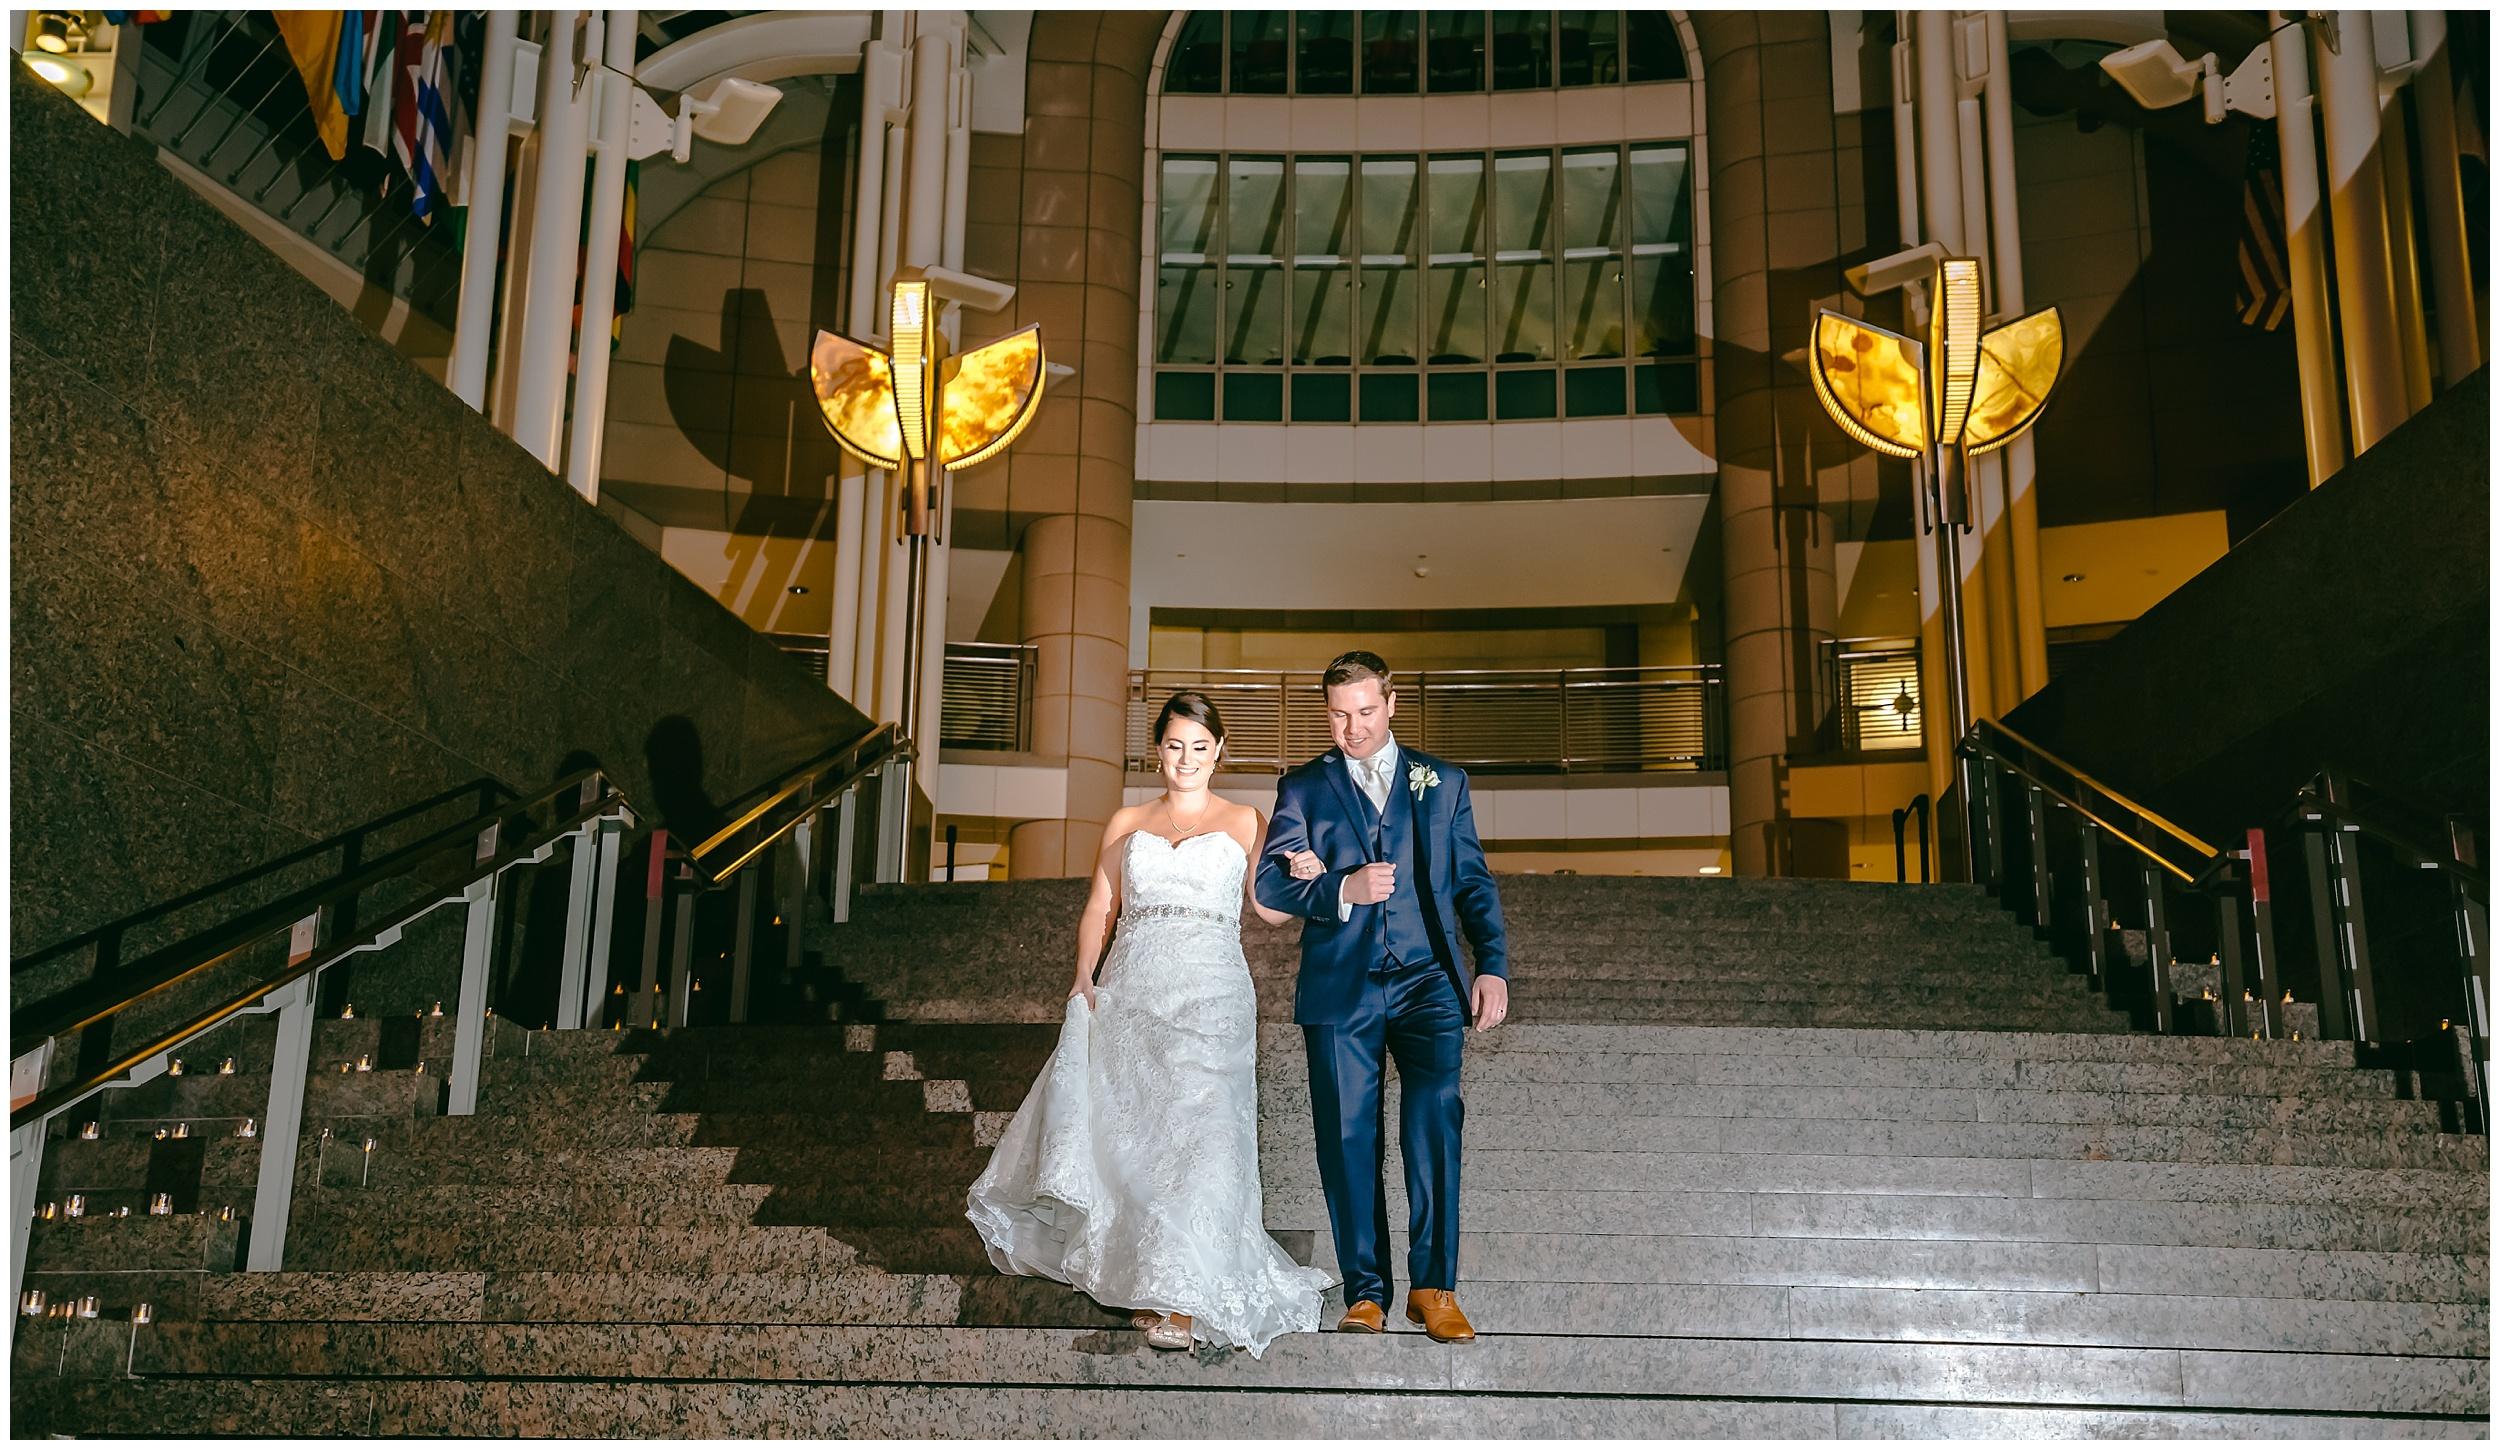 wedding-reception-bride-groom-entrance-introductions-ronald-reagan-washington-dc-photographer